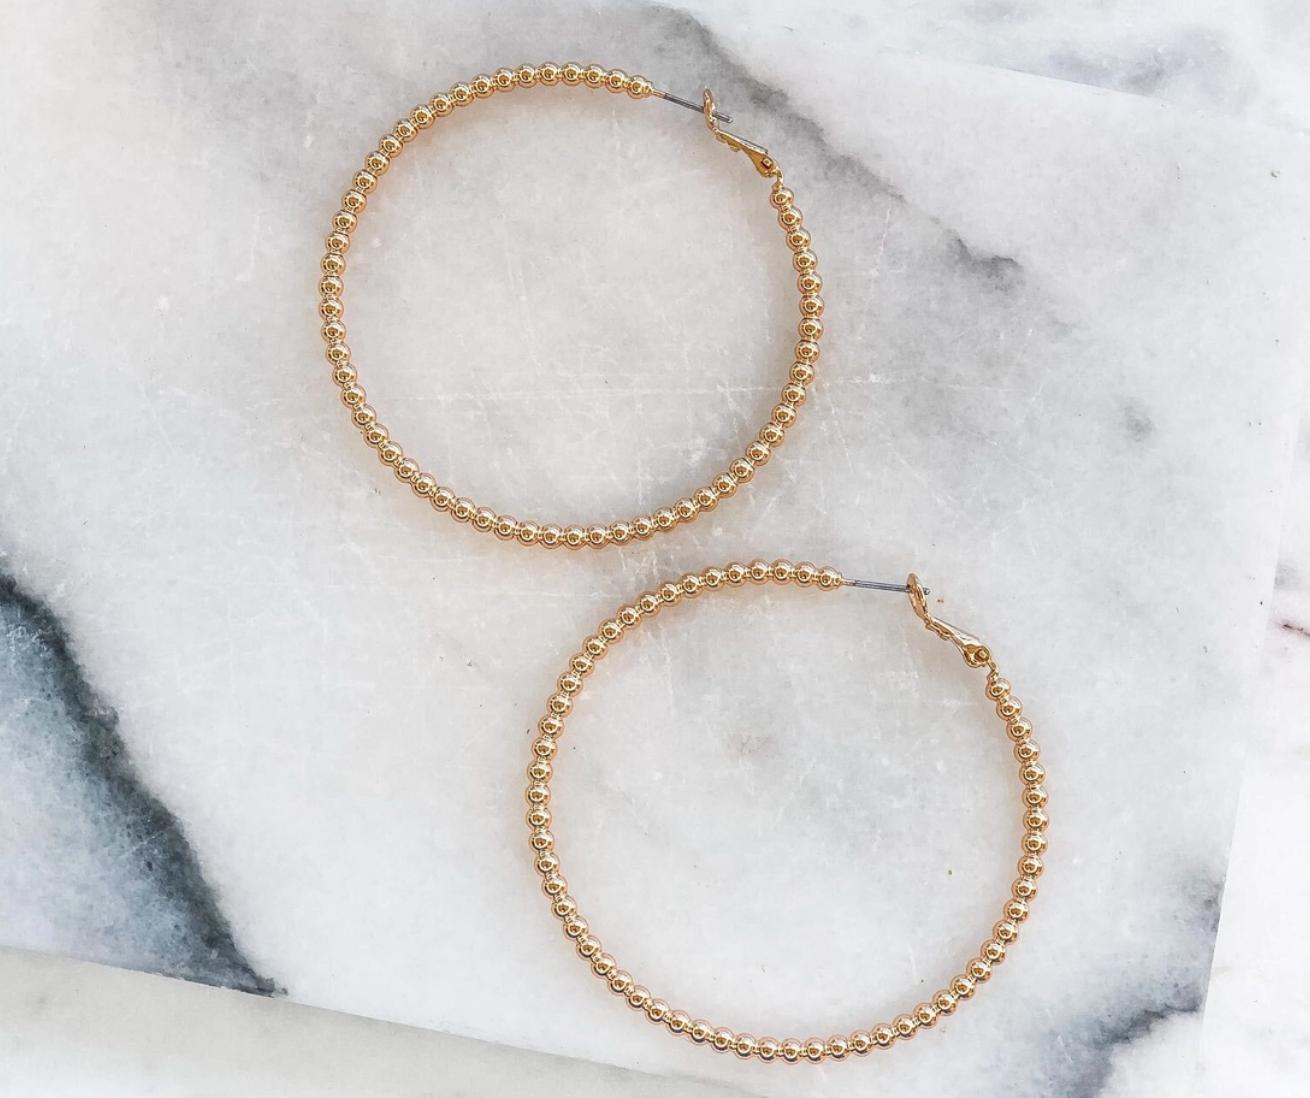 Classic gold beaded hoop earrings